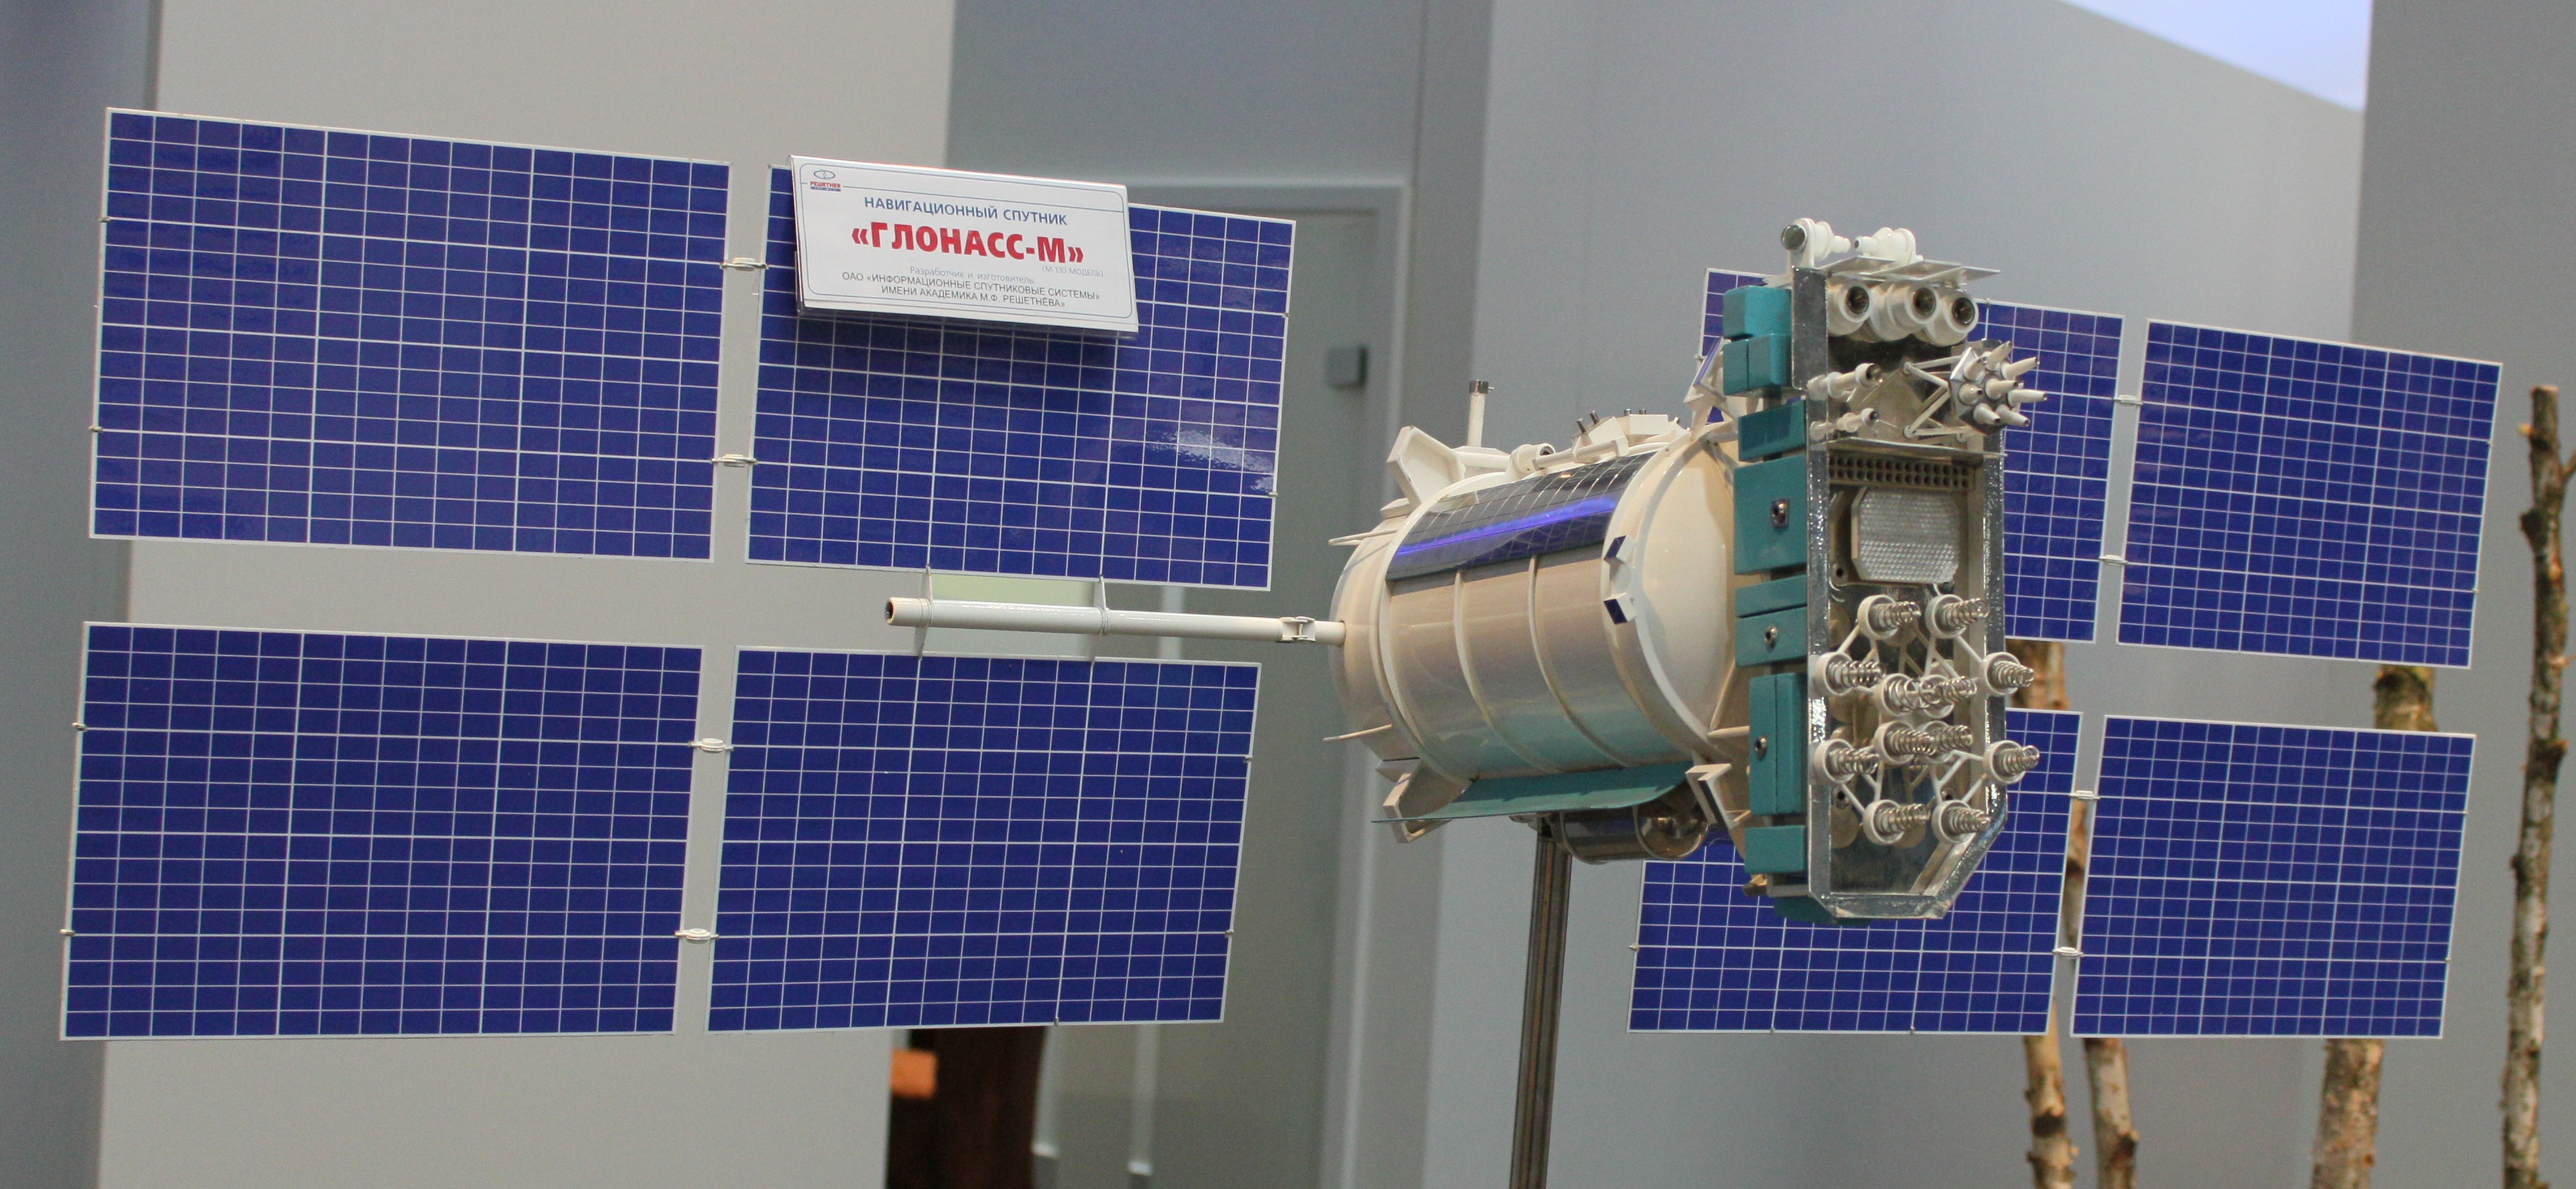 Depiction of GLONASS